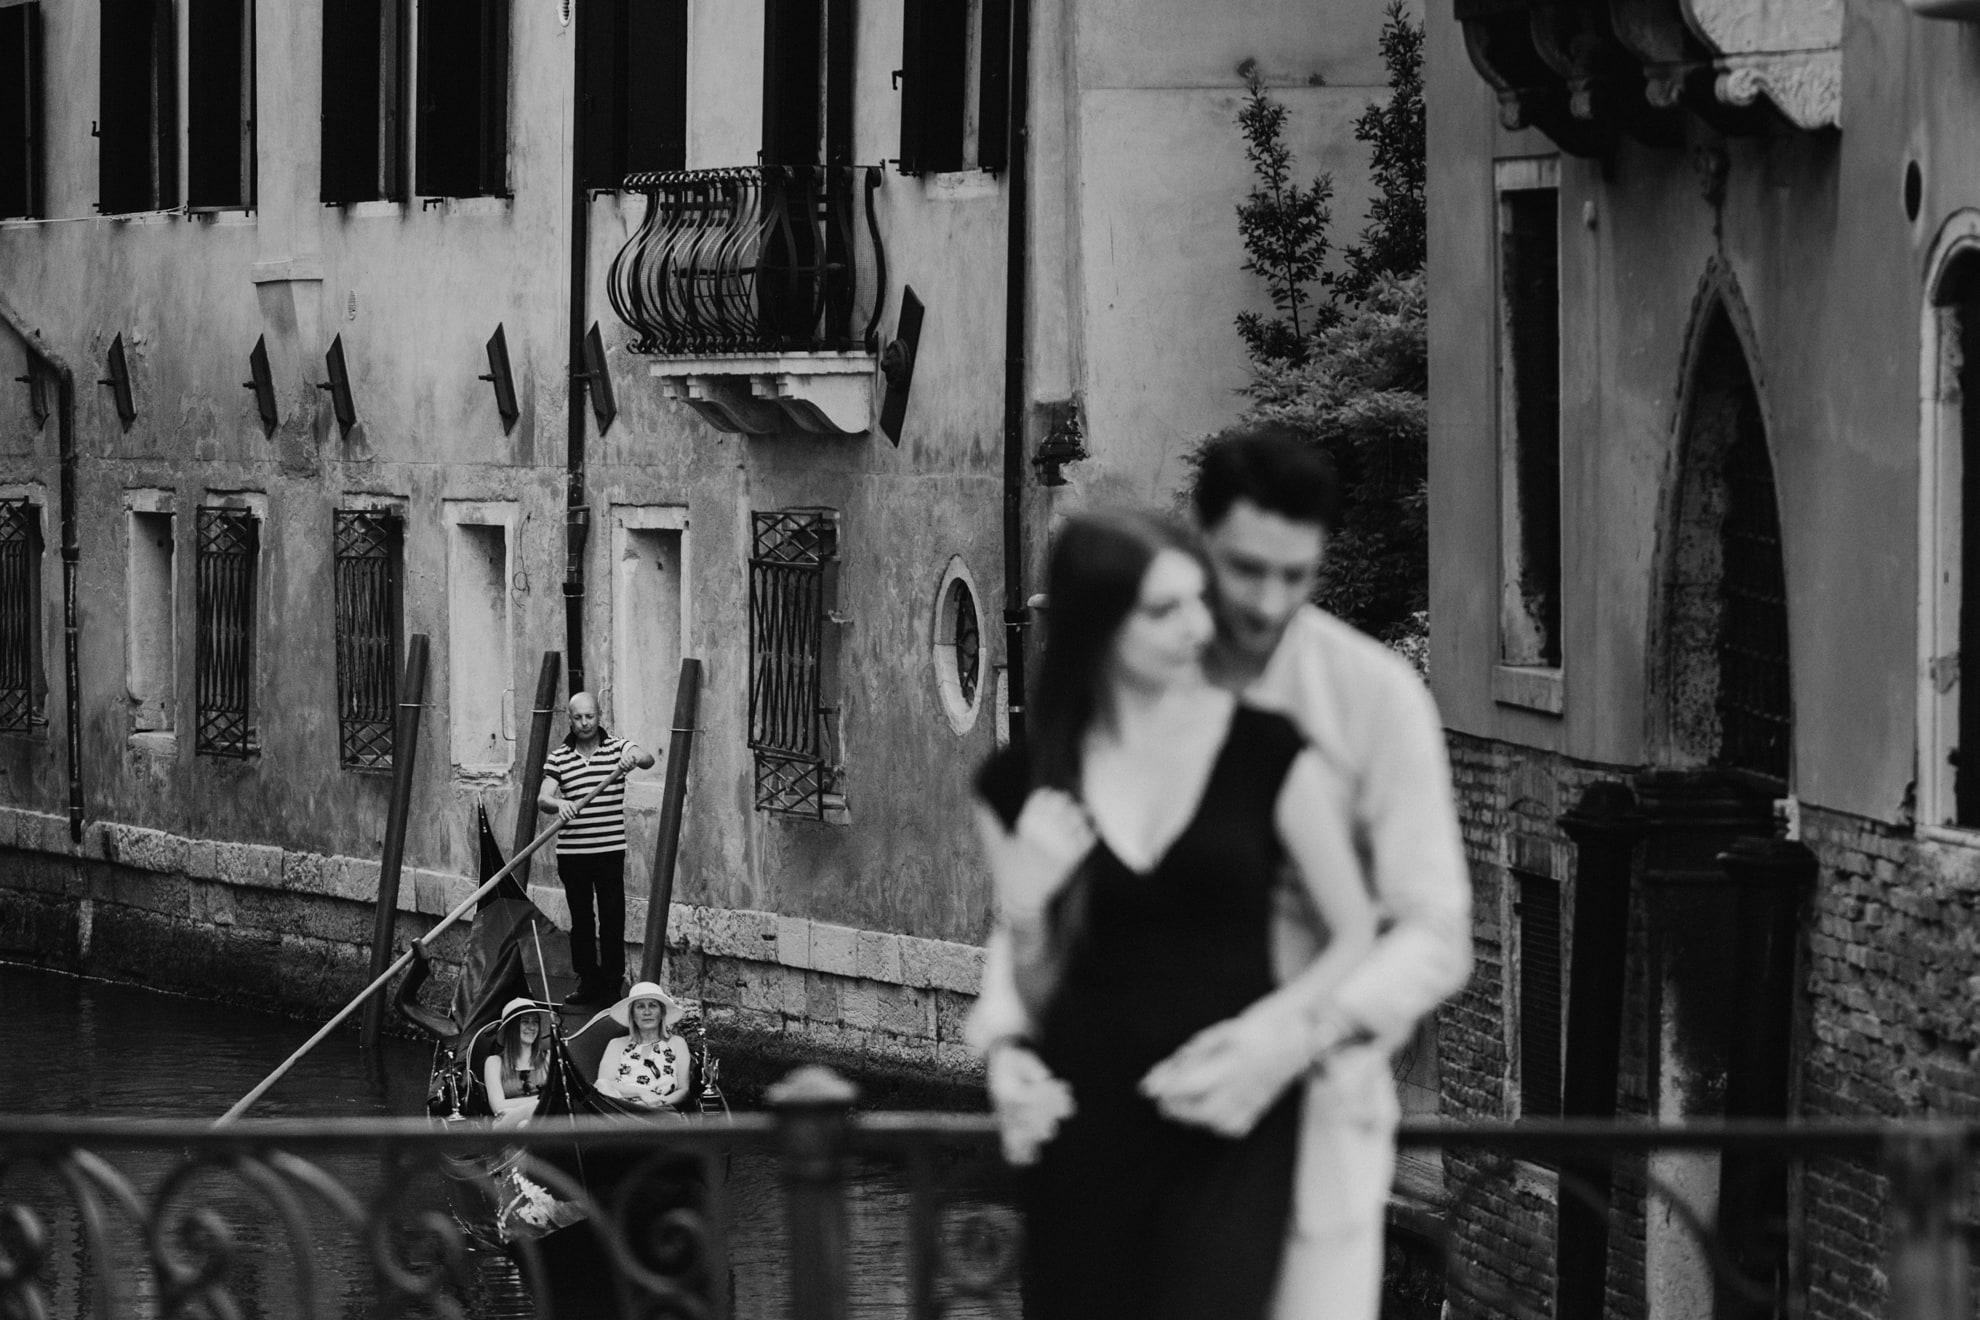 engagement venice venezia proposal proposta matrimonio fidanzamento irene pollacchi fotografa 6